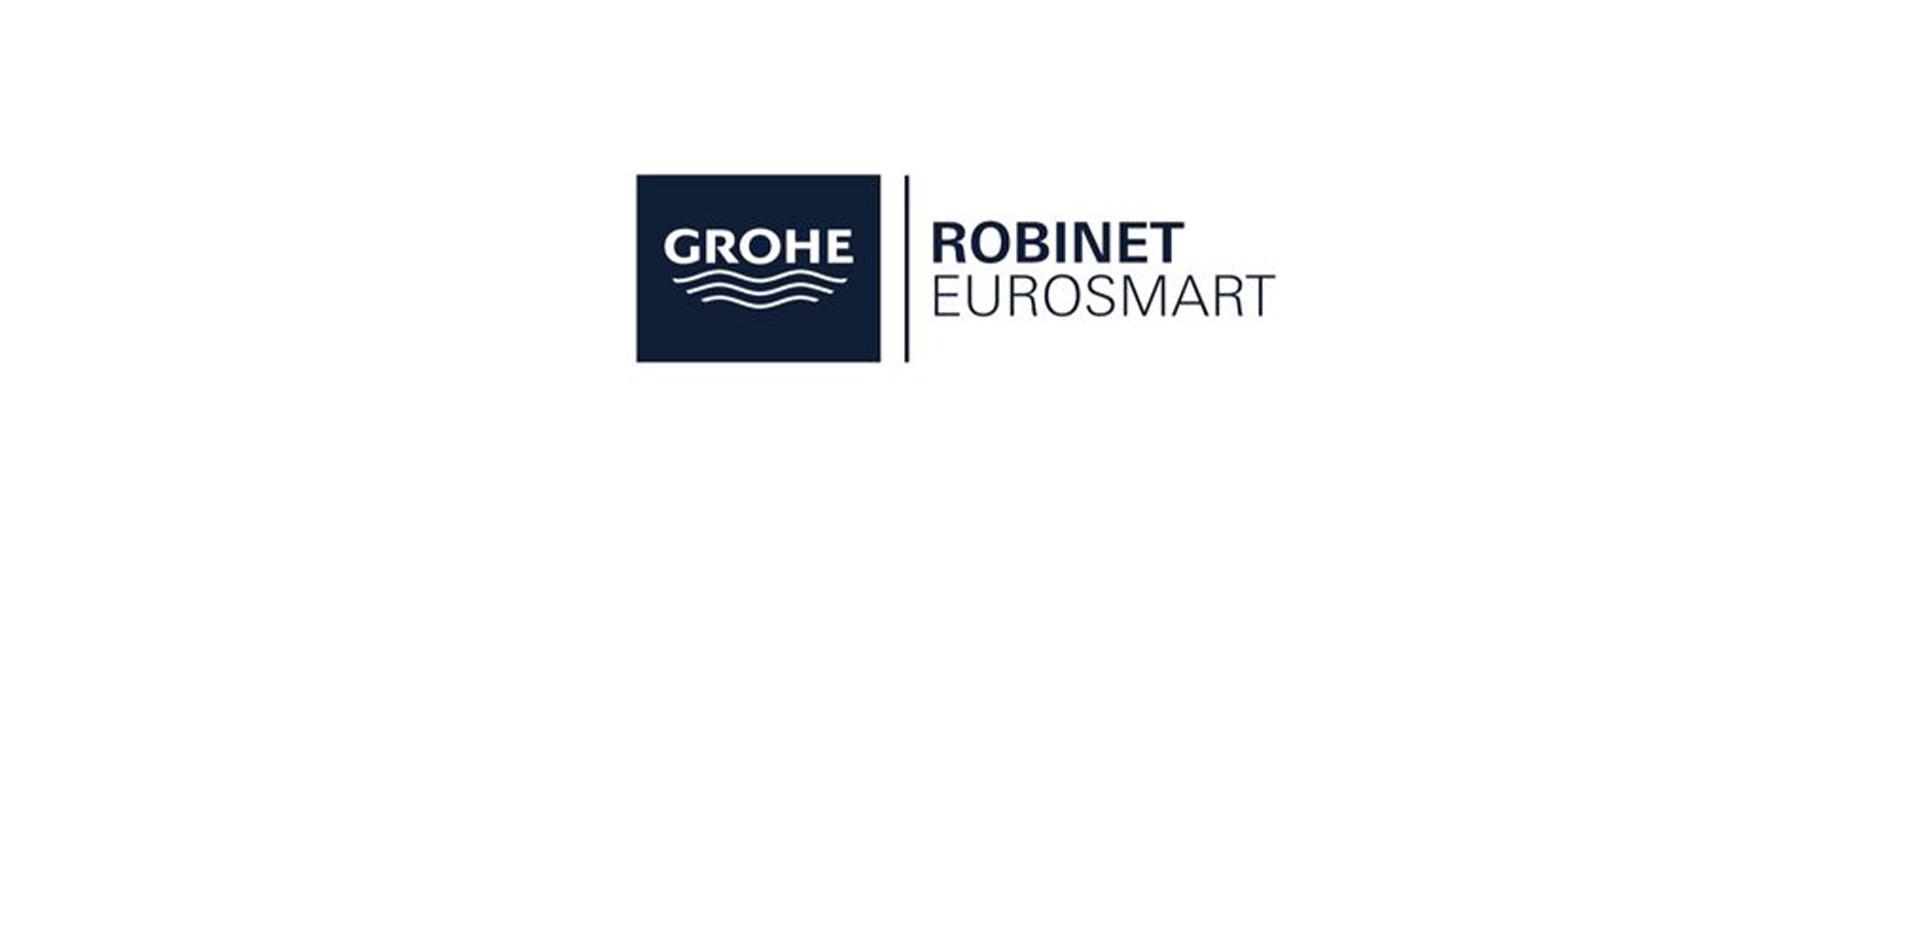 Robinet mitigeur Grohe Eurosmart